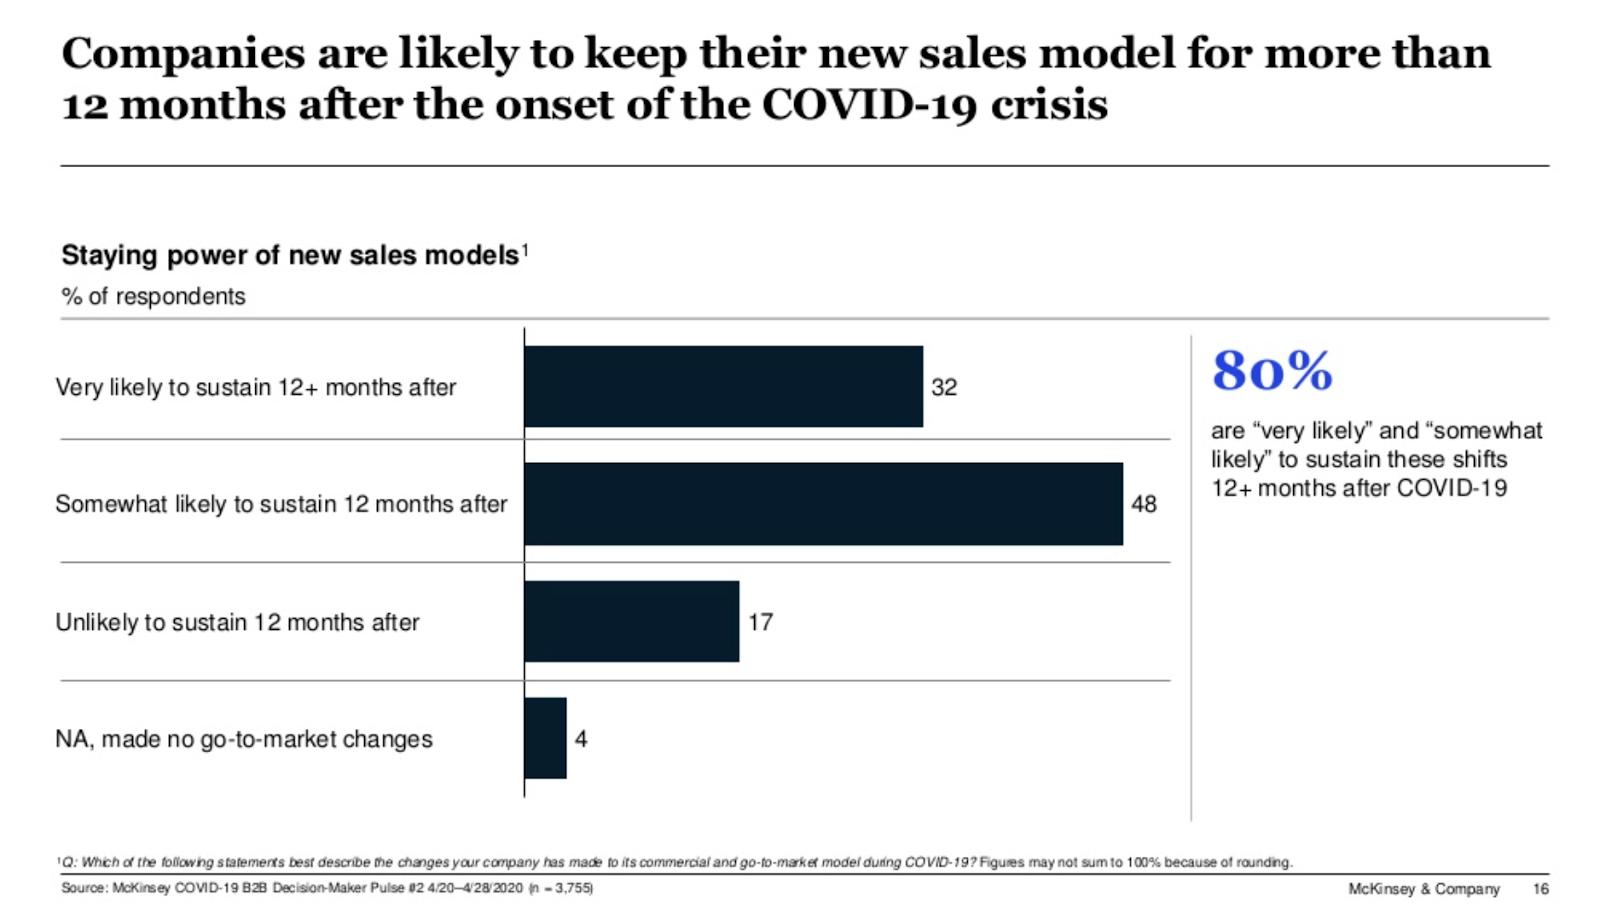 B2B sales model